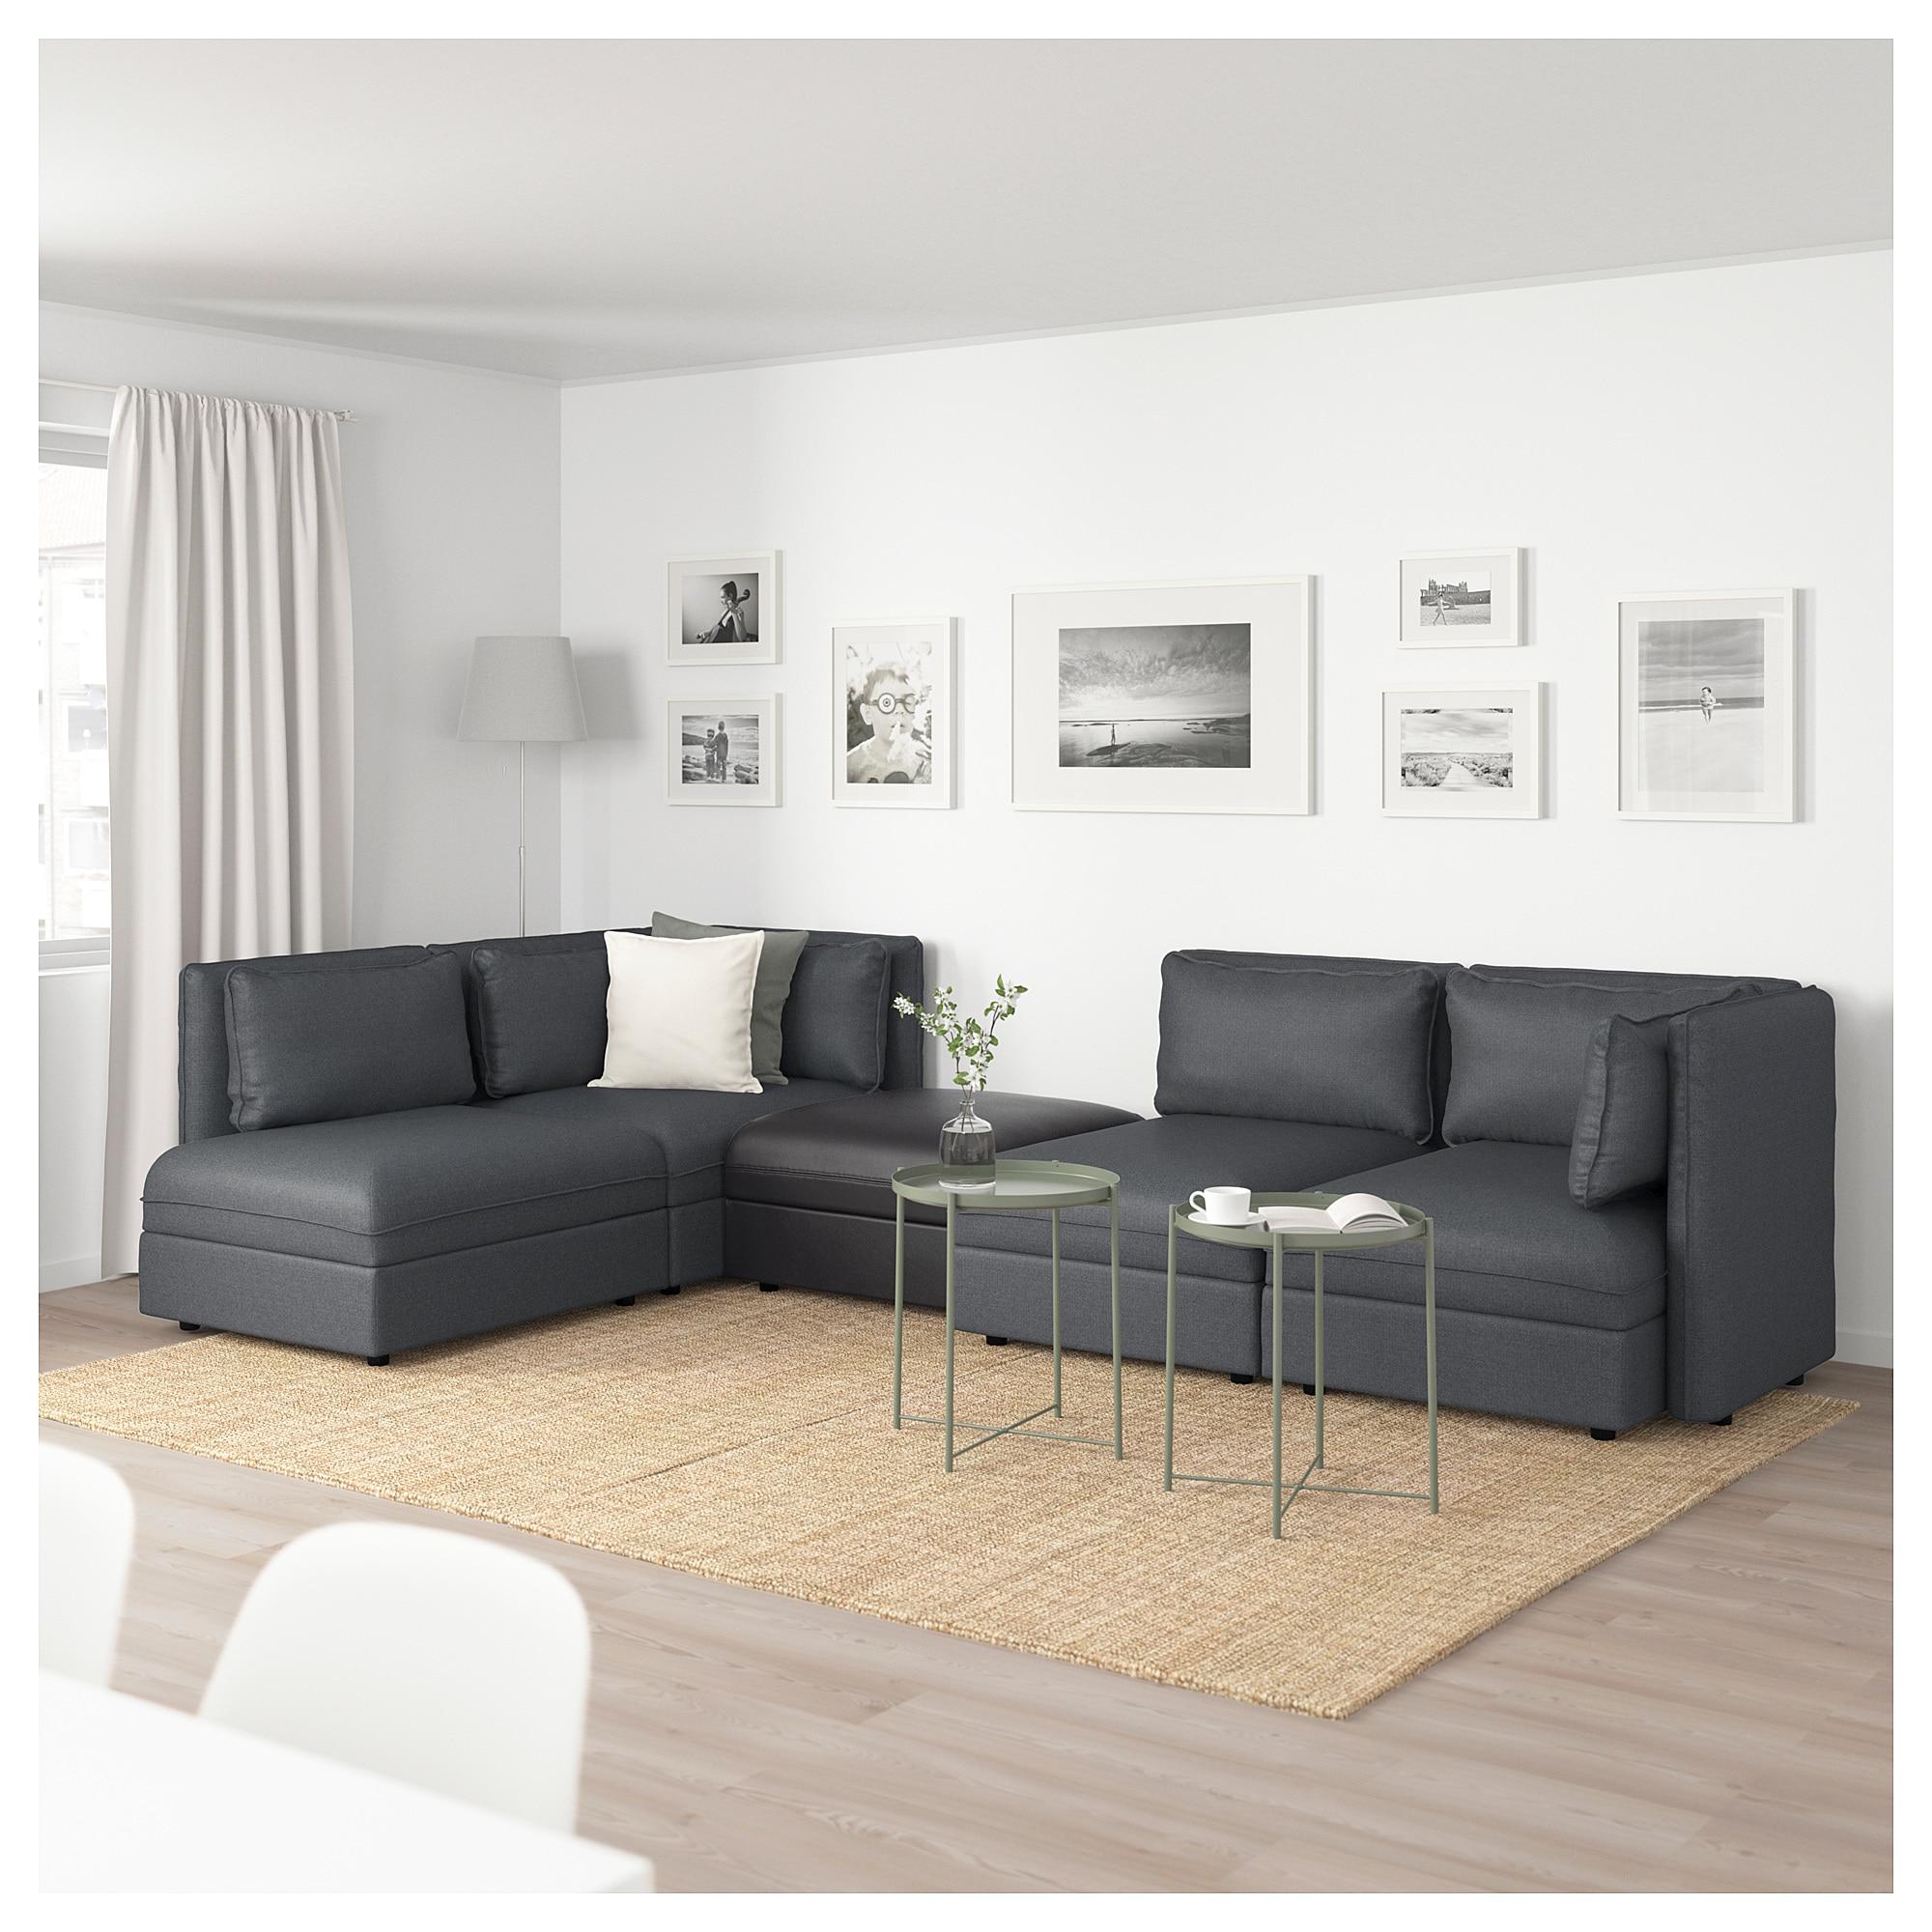 VALLENTUNA Modular corner sofa, 4seat with storage